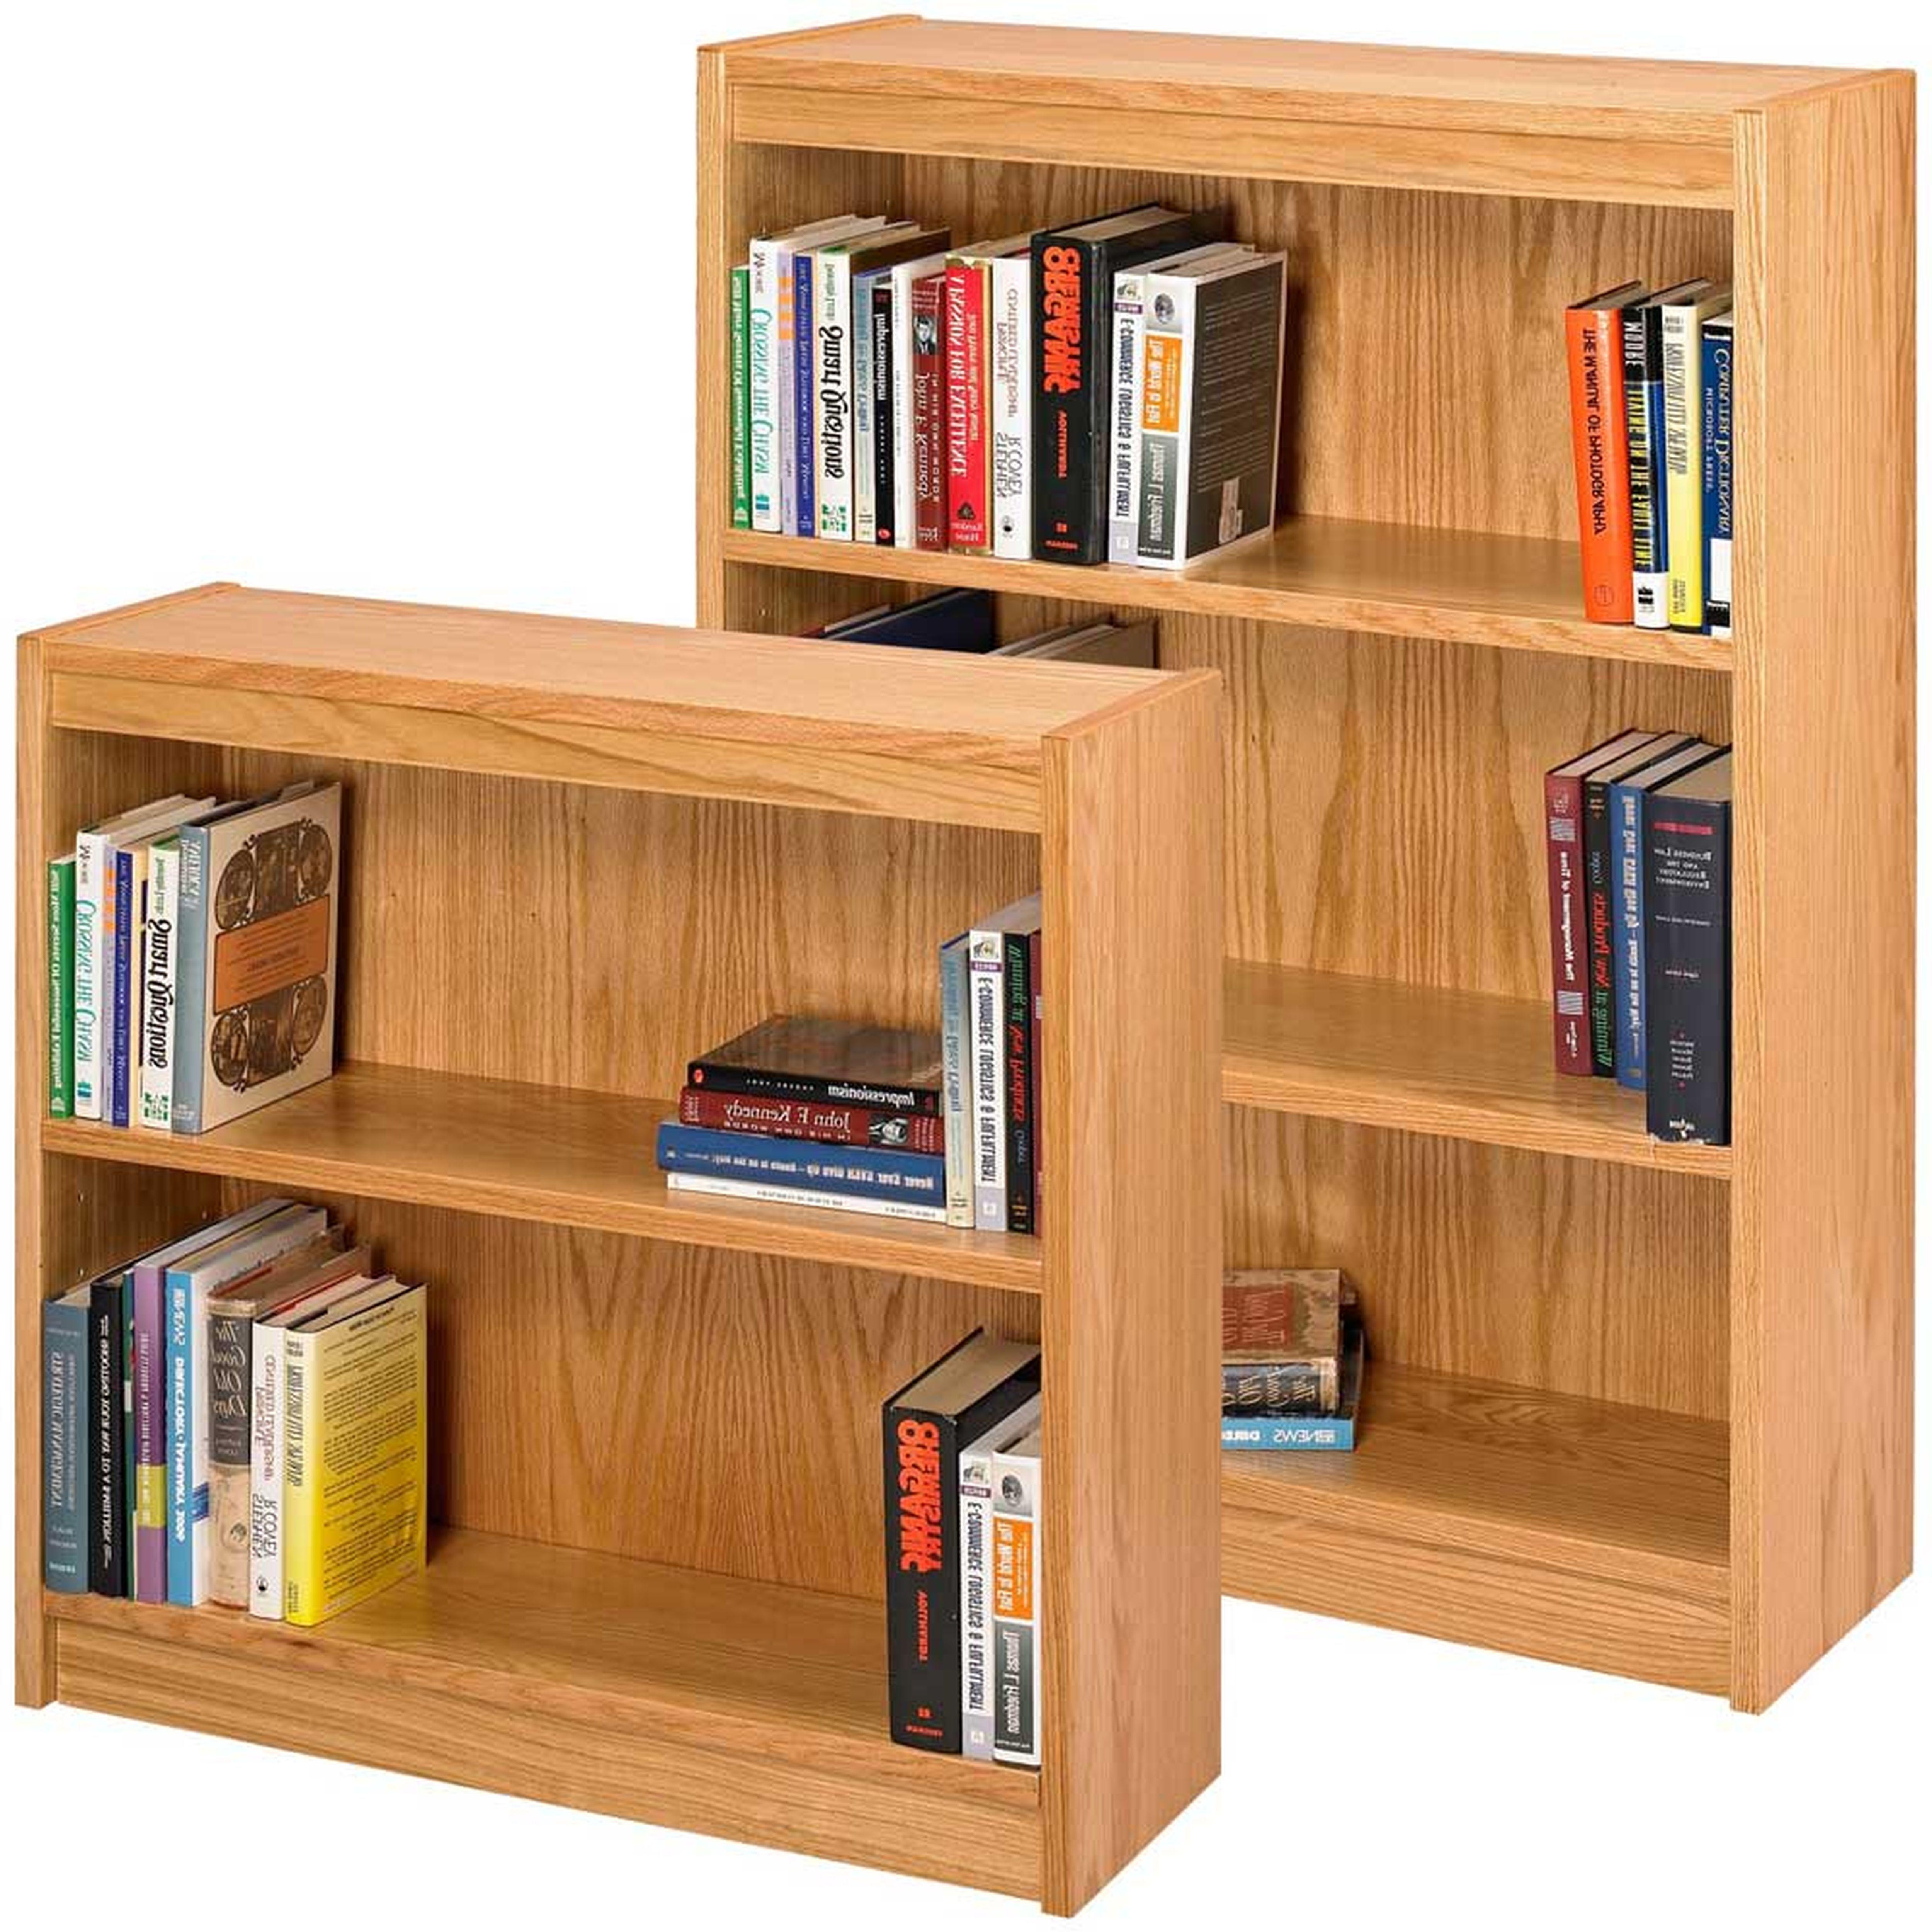 Do It Yourself Bookshelf Ideas: 8 Easy DIY Bookshelves Ideas For Book Lovers